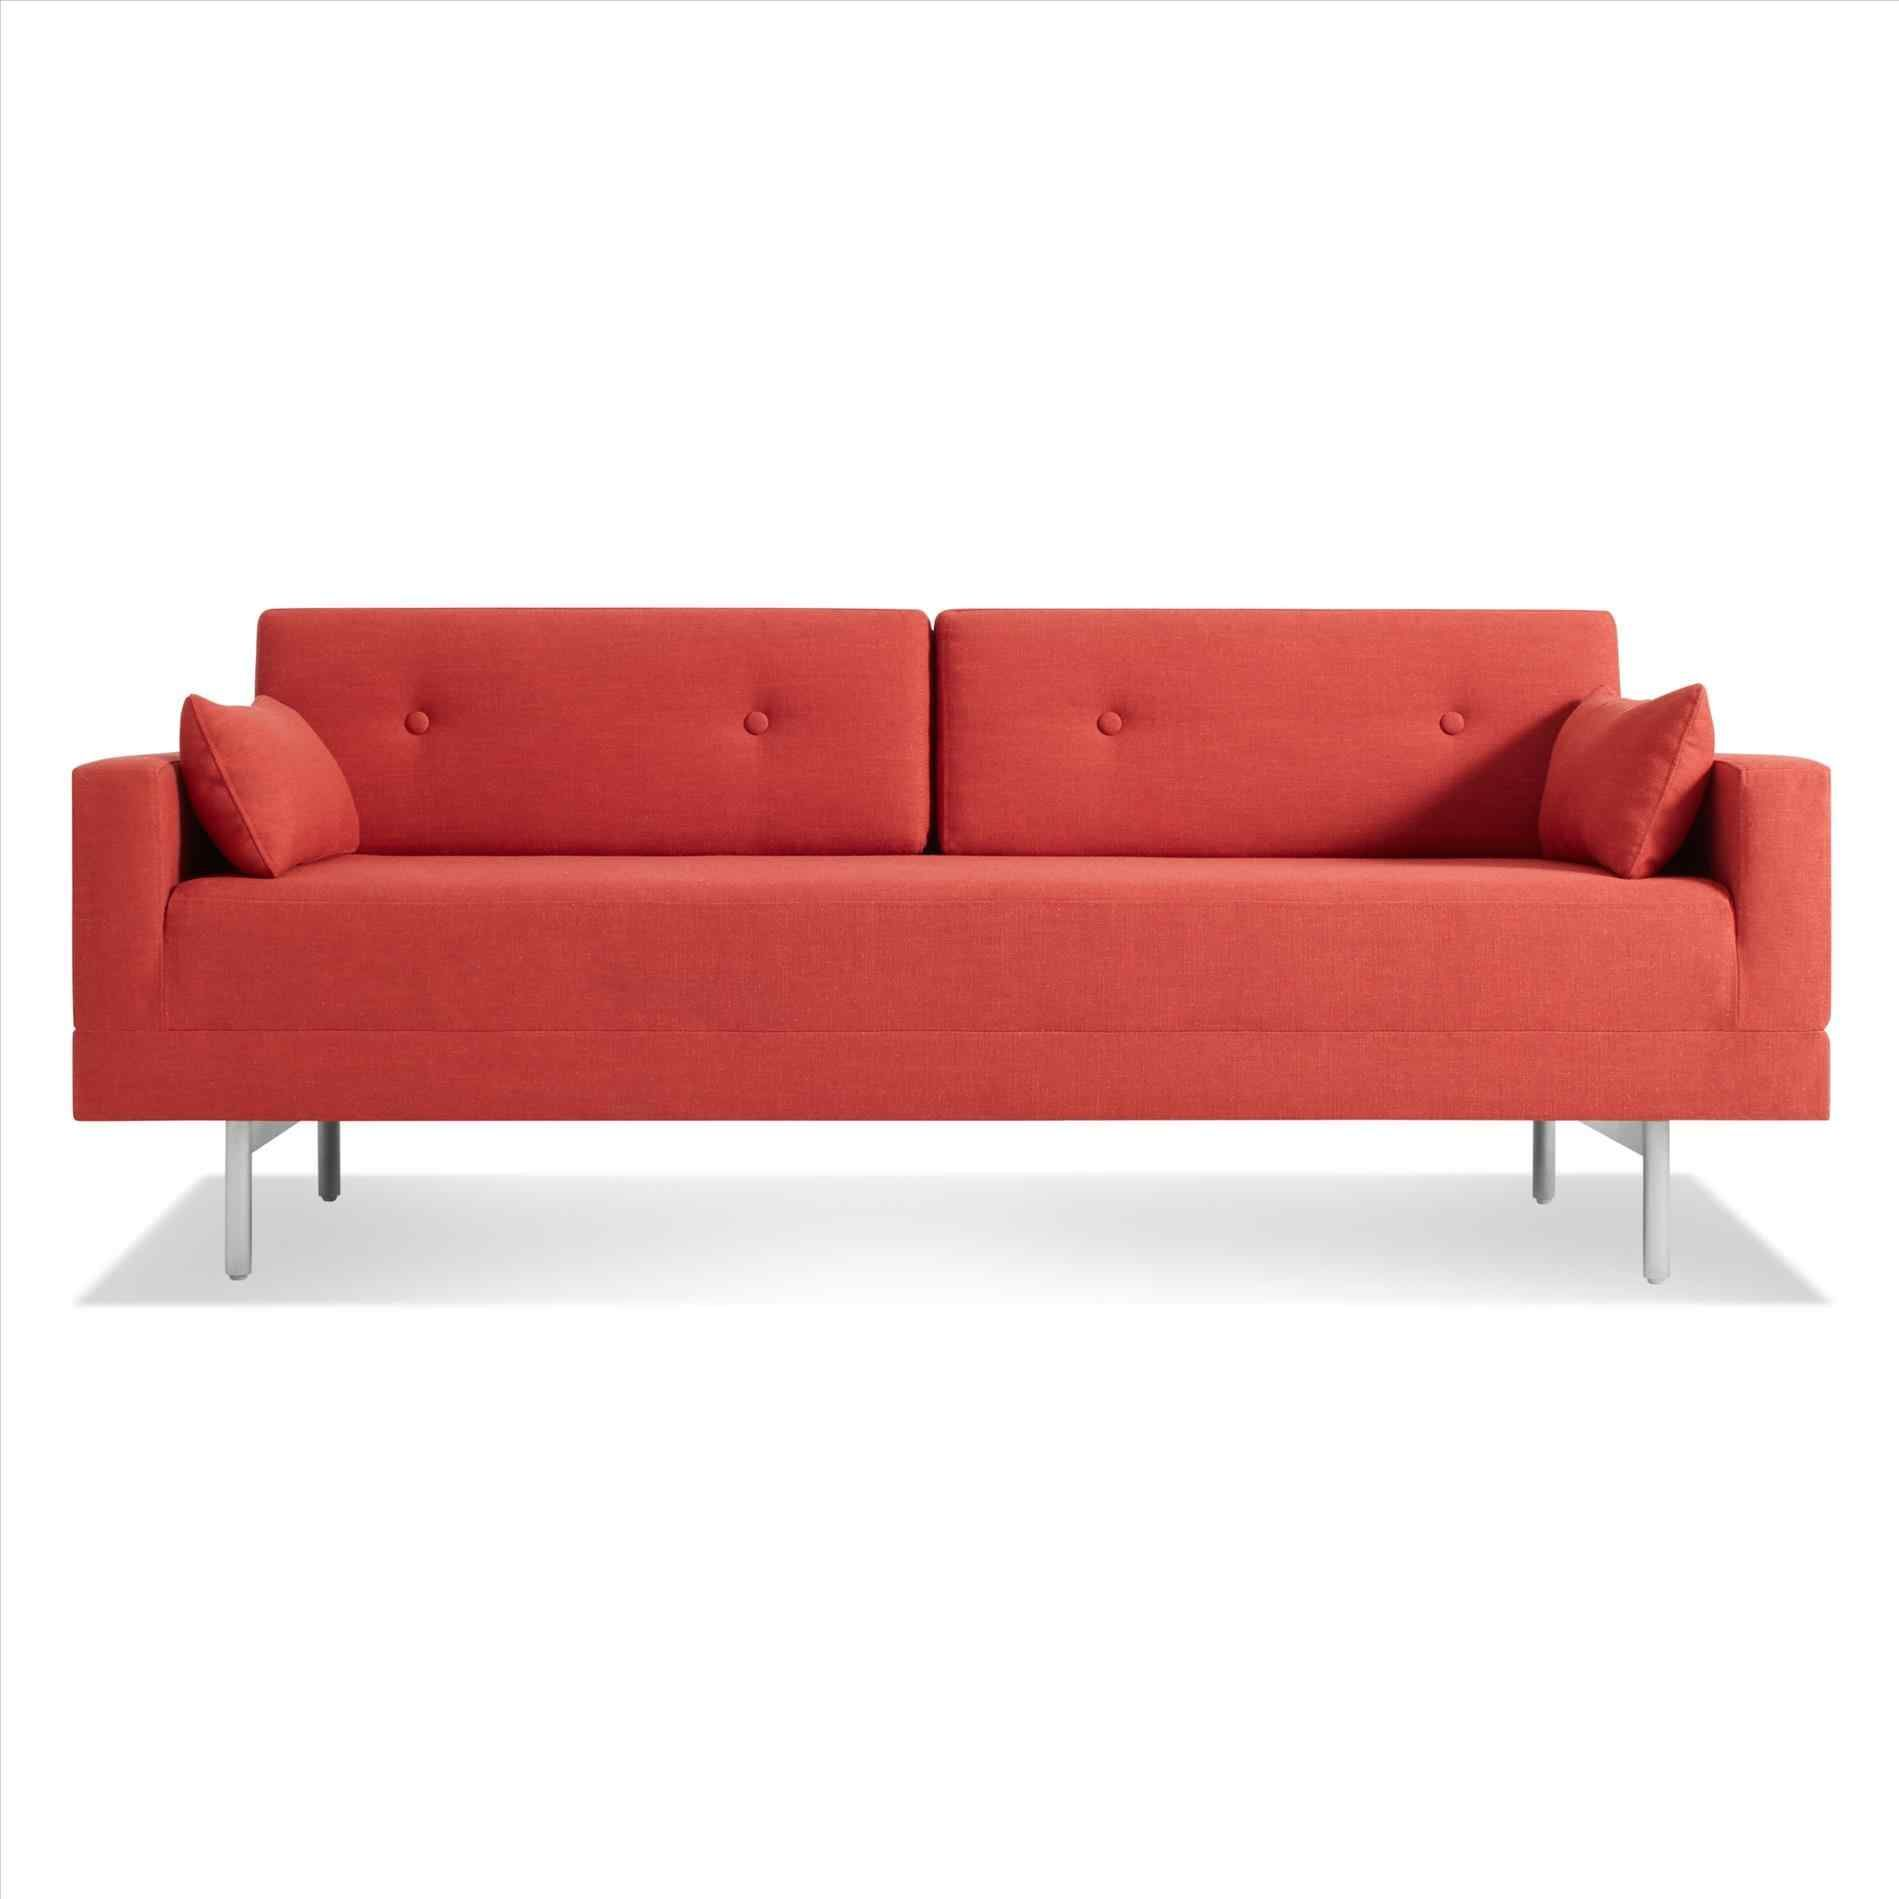 one blue dot sleeper sofa night stand modern queen blu mono single rh pinterest com